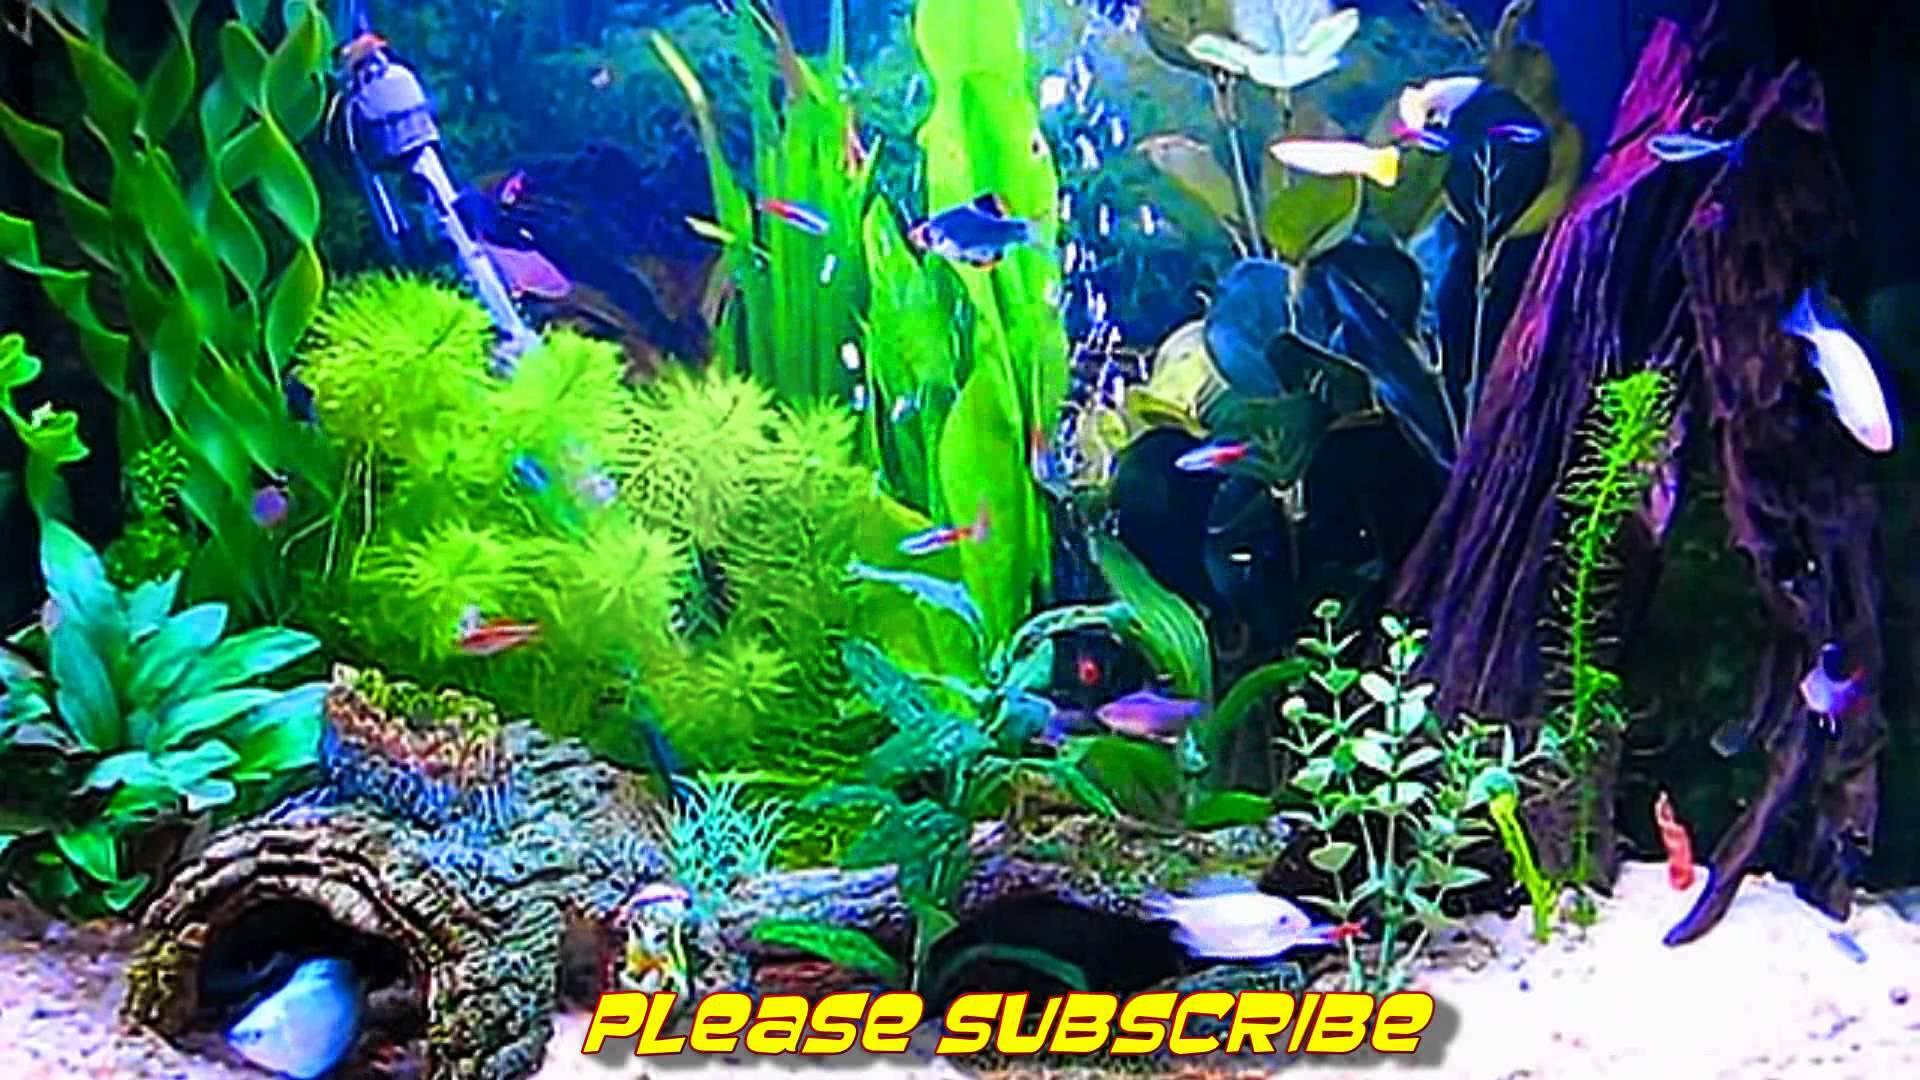 Amazing HD Aquarium ScreenSaver Windows and Android 1920x1080